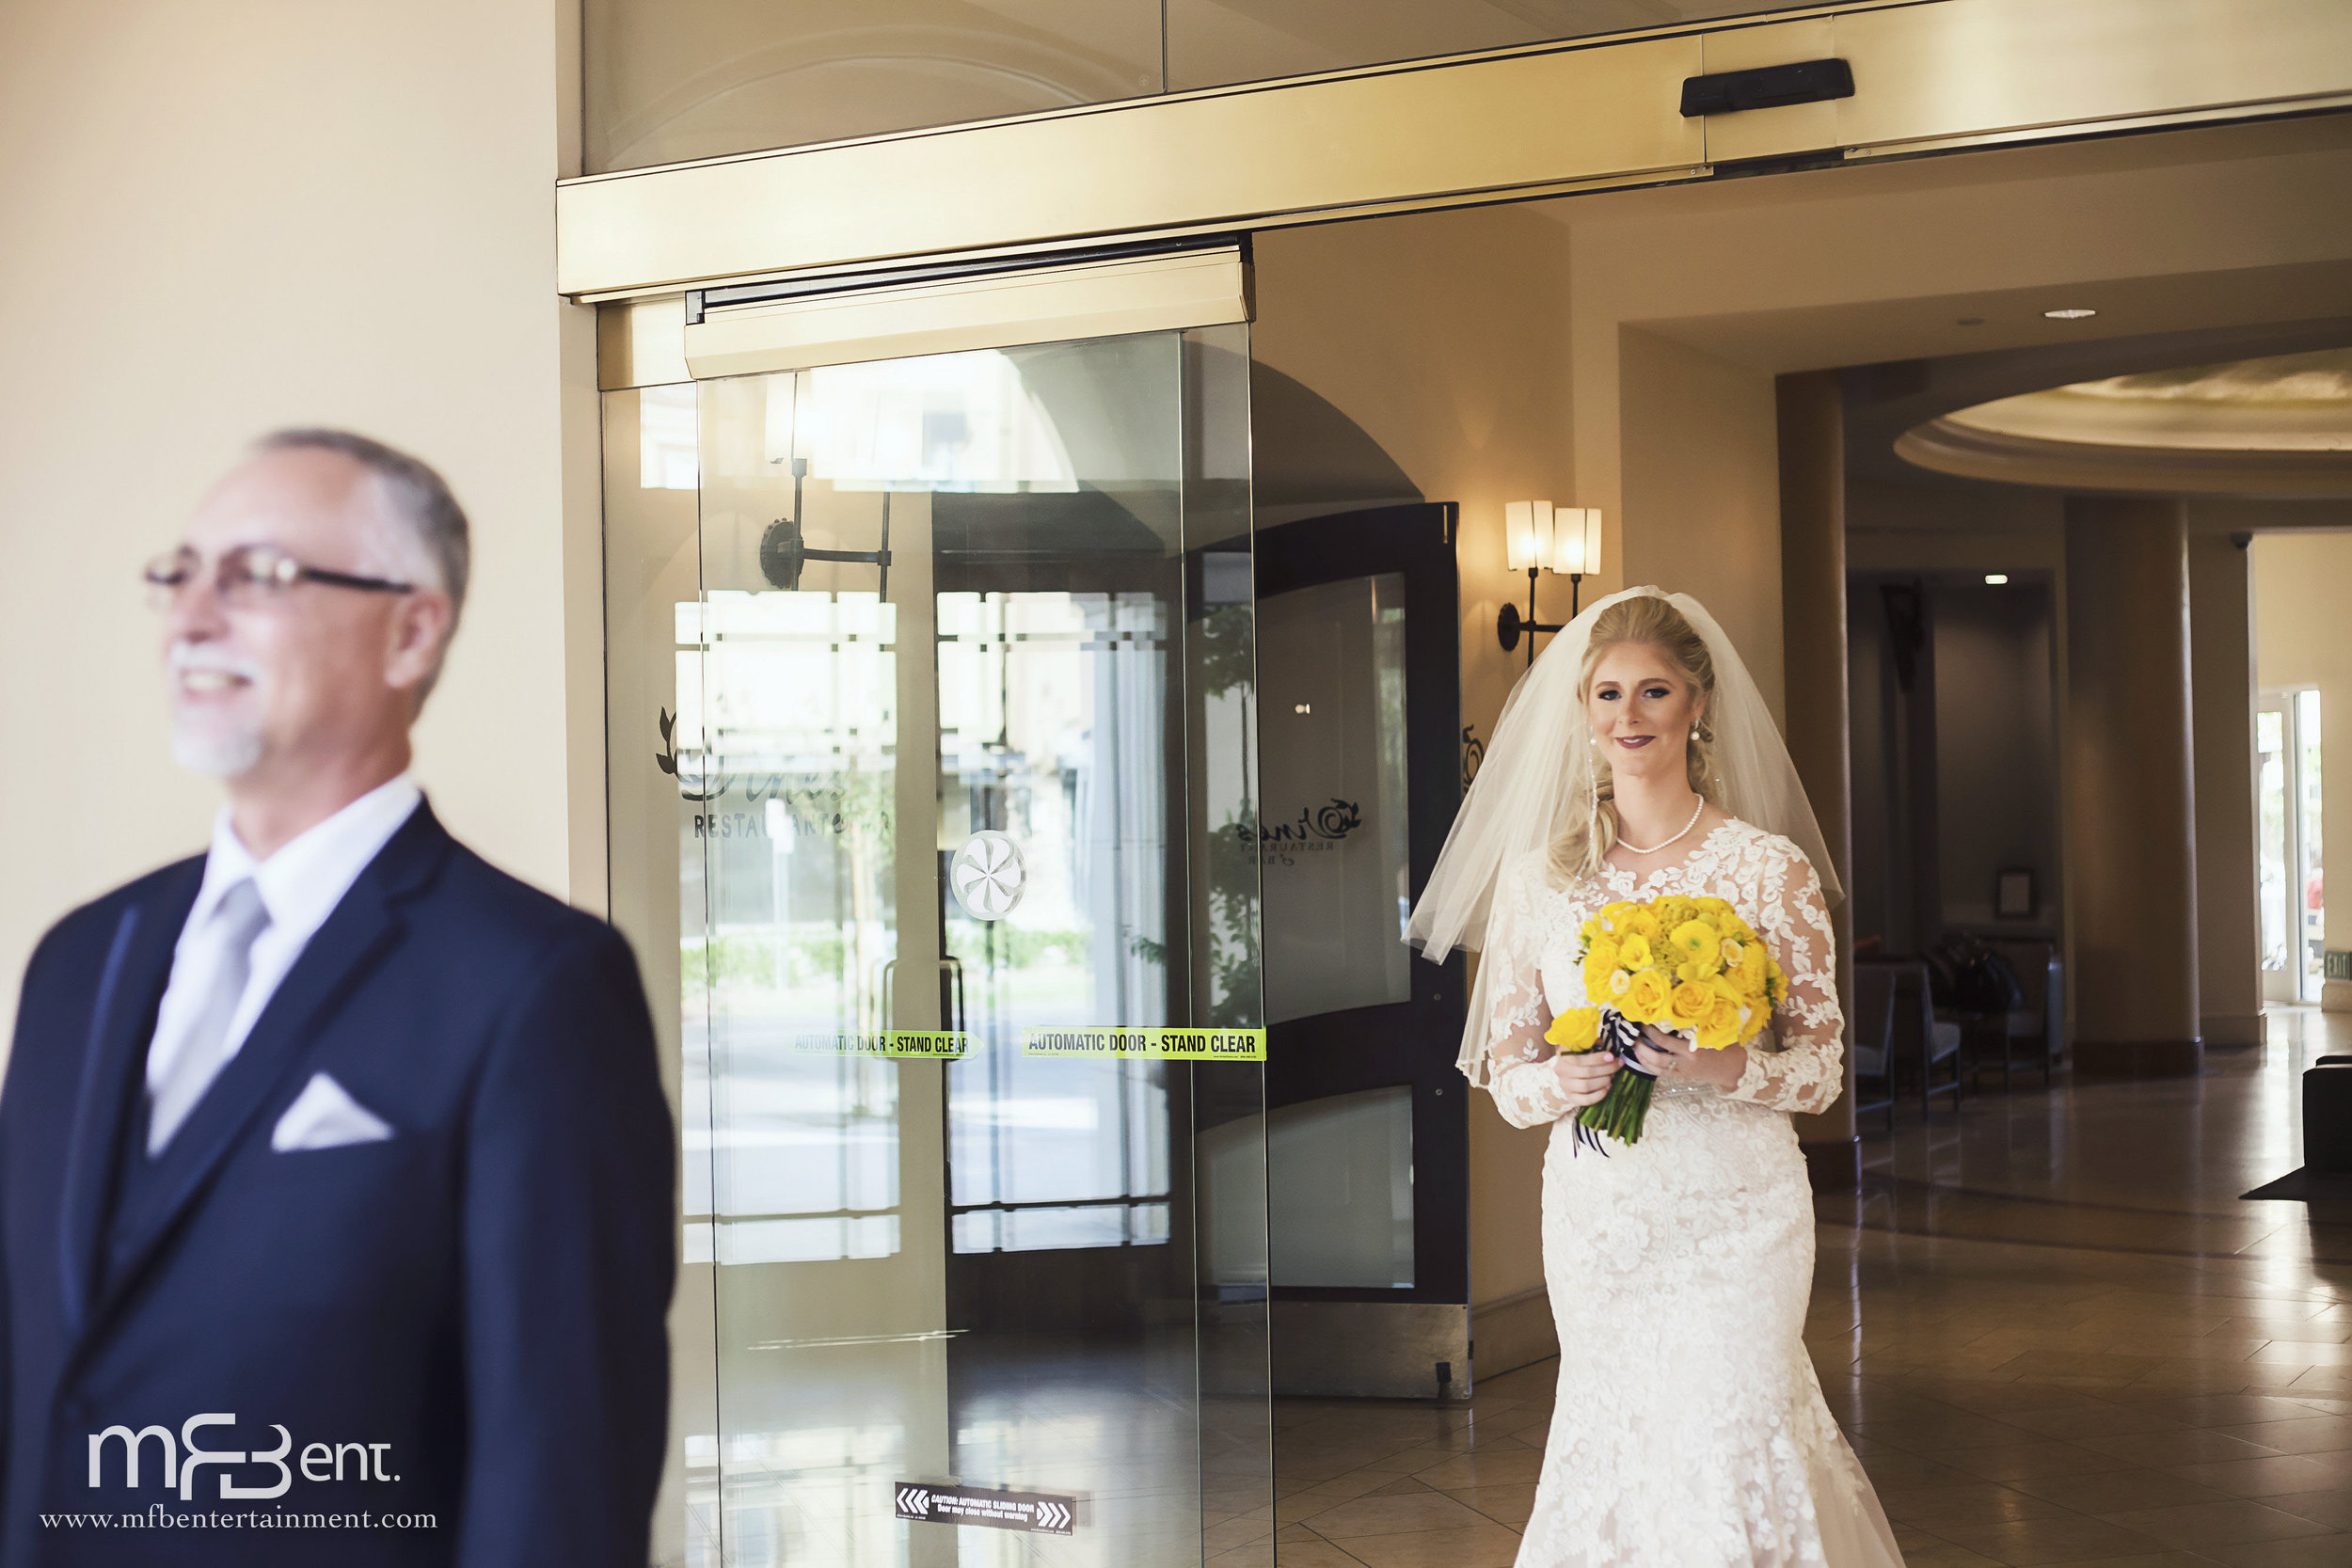 PIOTR CHELSEA WEDDING-PRE CEREMONY-0128 L.jpg